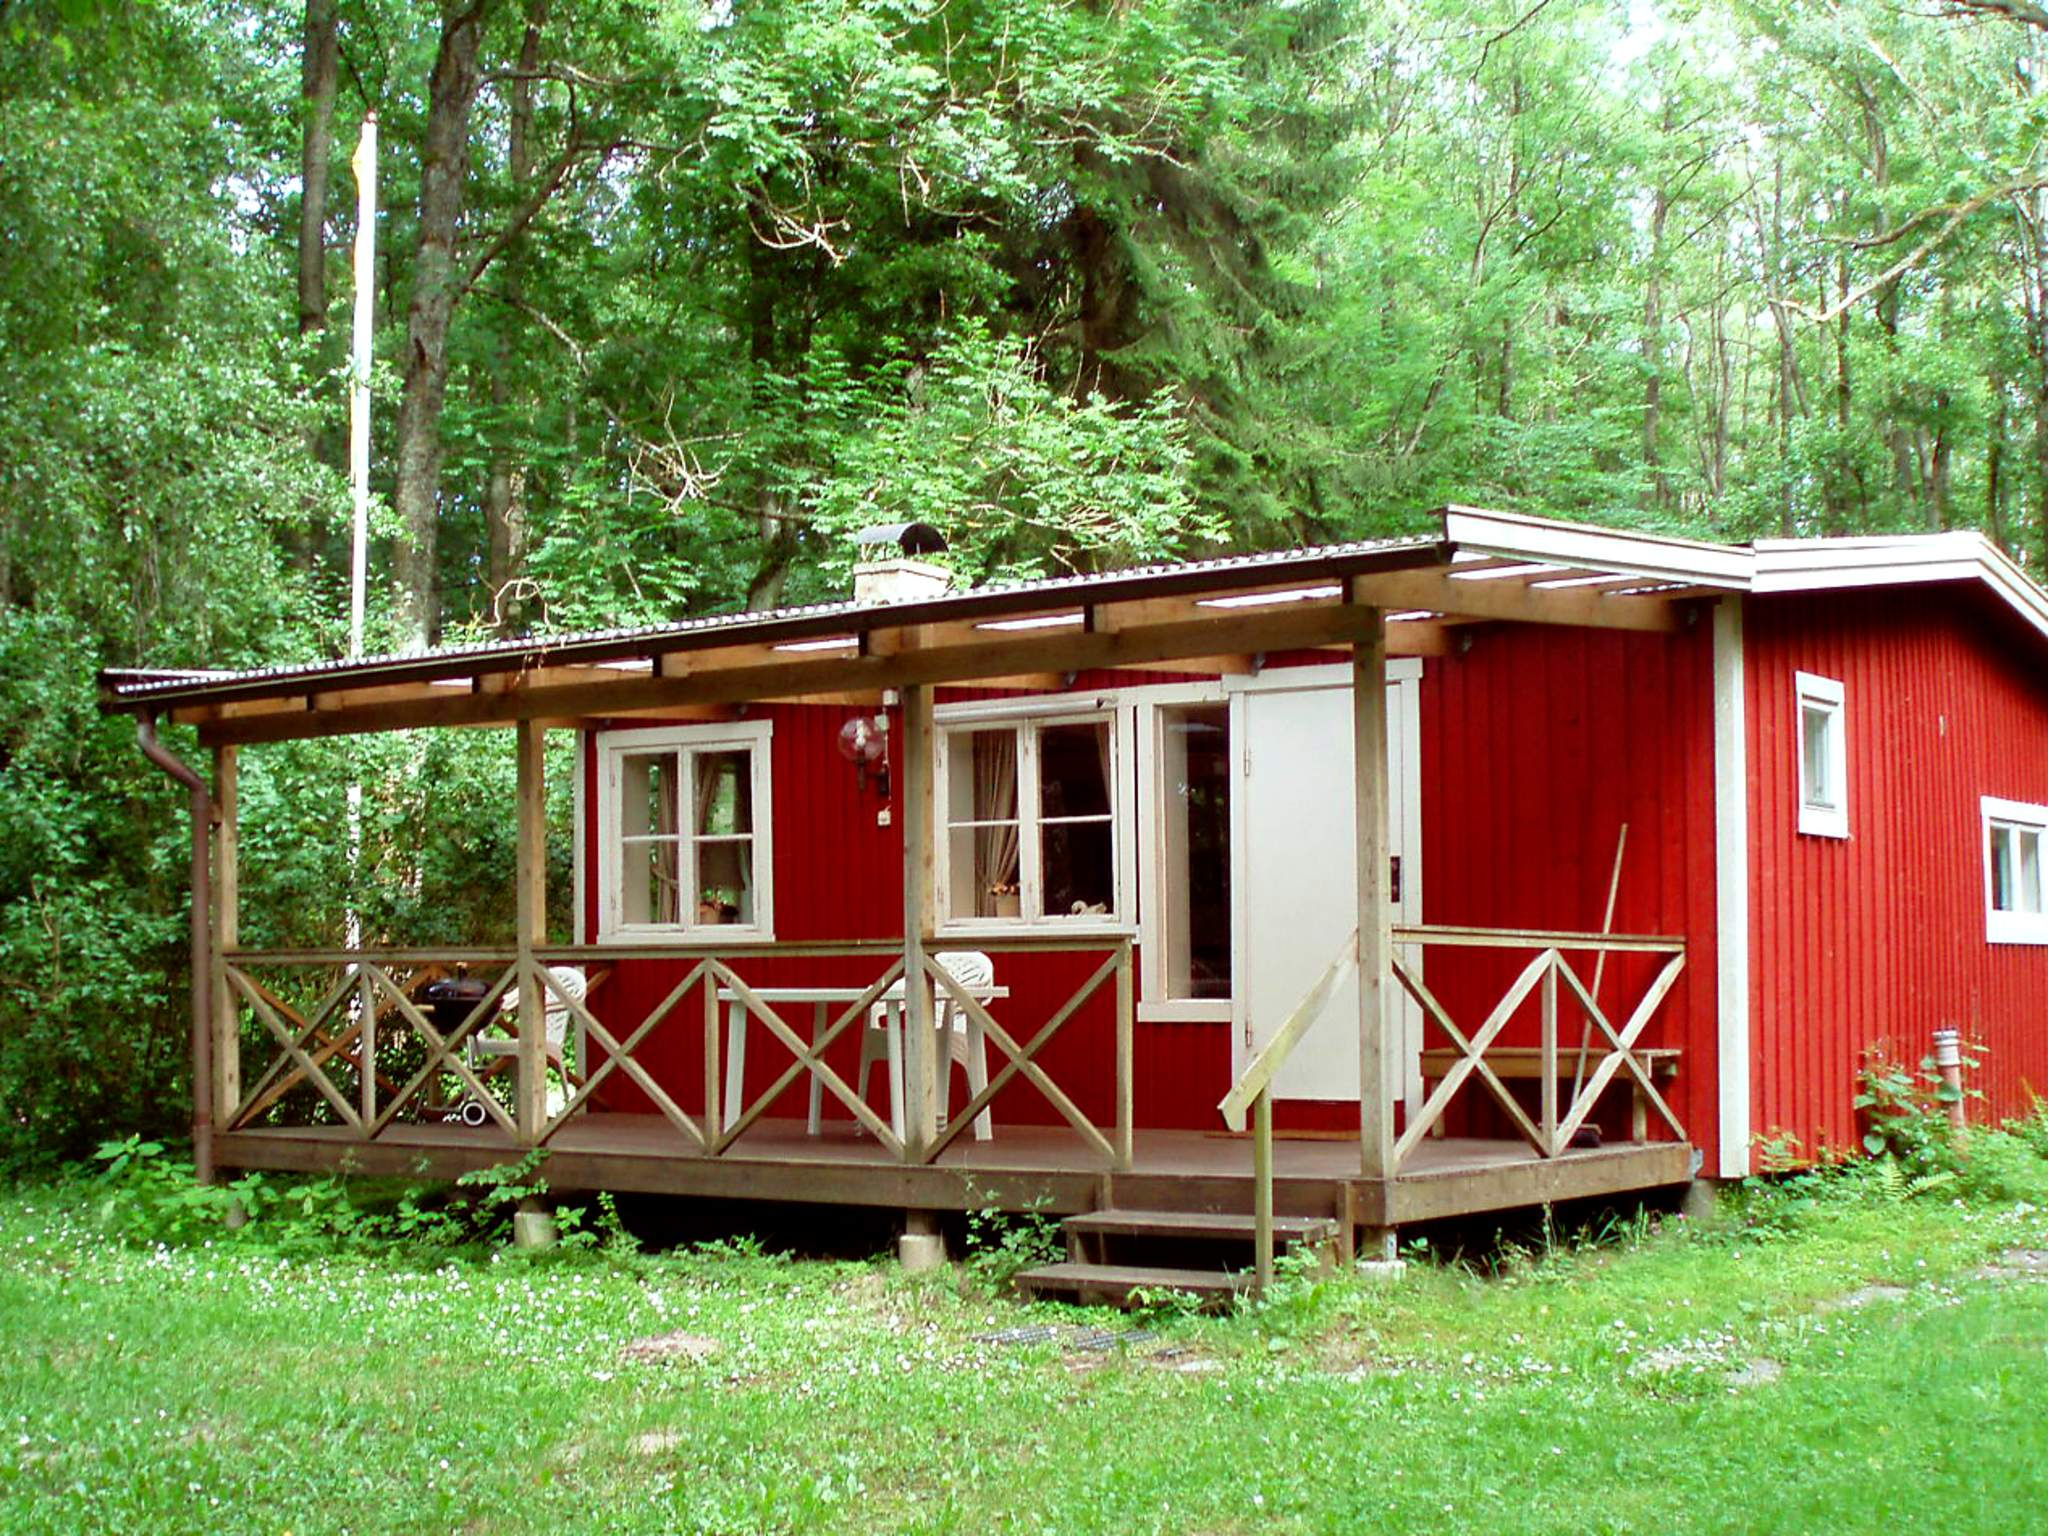 Ferienhaus Melldala (82042), Lerdala, Västra Götaland län, Westschweden, Schweden, Bild 1